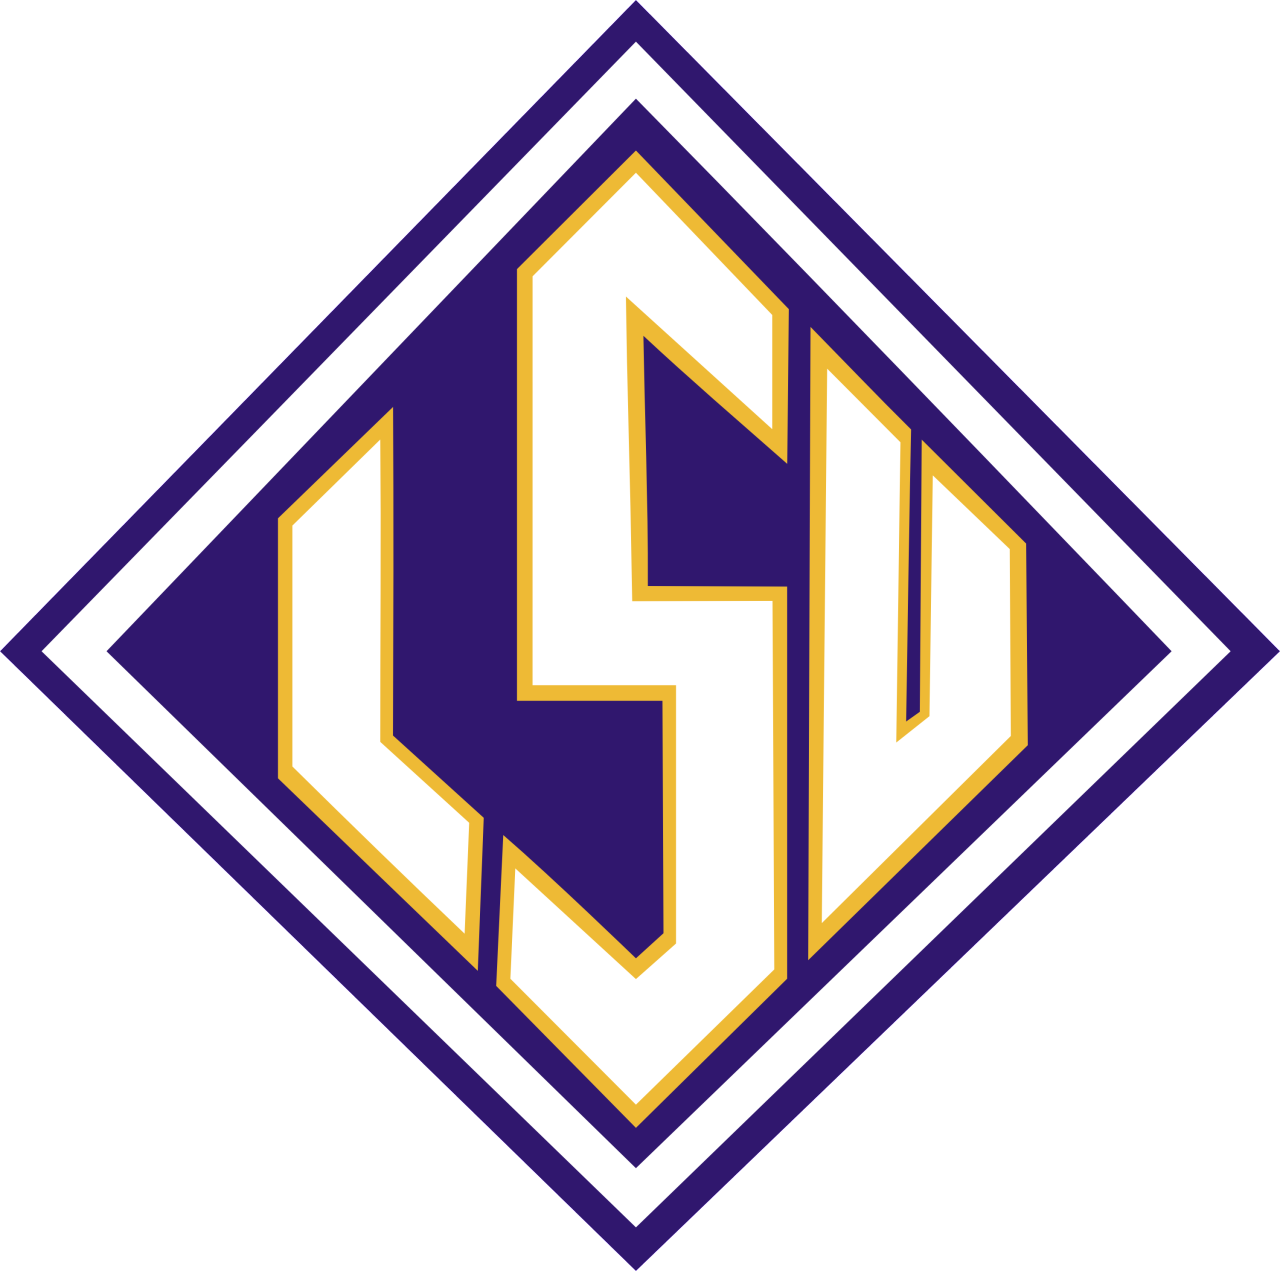 Lsu baseball clipart graphic freeuse stock lsu logo | Sports logos | Pinterest | Logos graphic freeuse stock